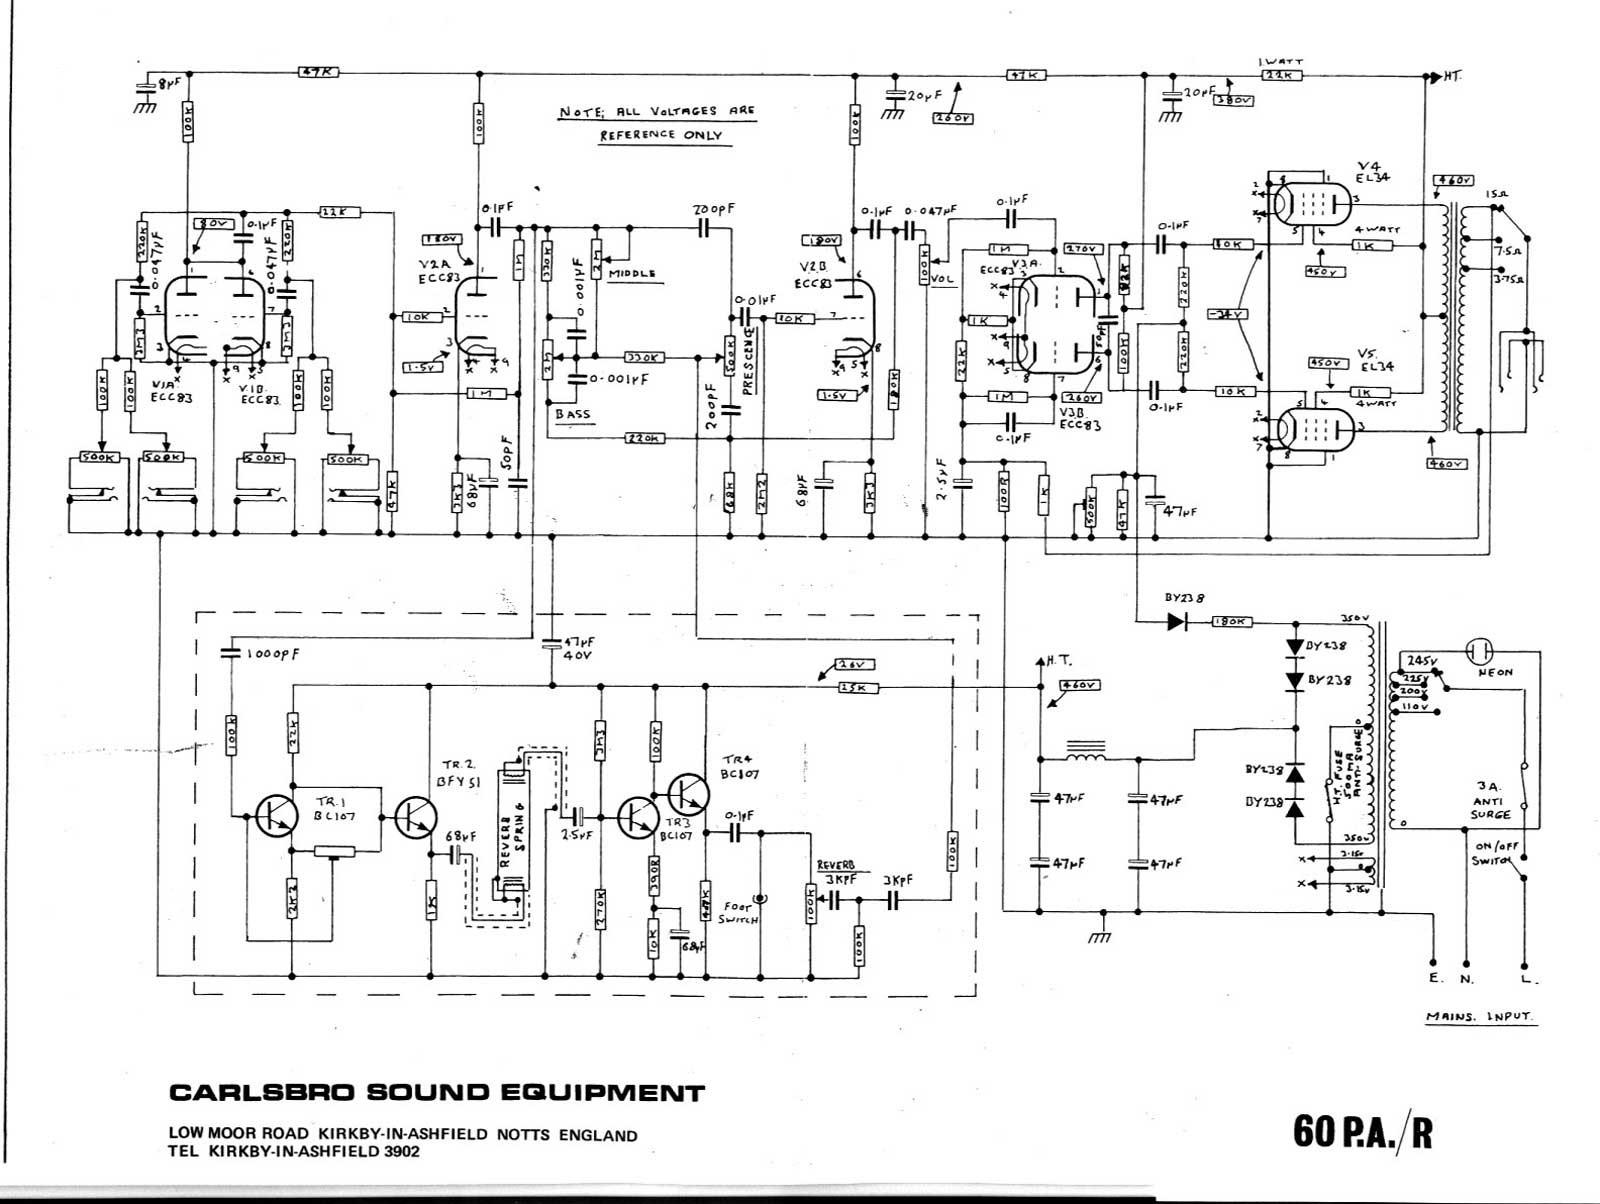 Car Power Amplifier Circuit Diagram Schematics Of Car Power Amplifier Circuit Diagram